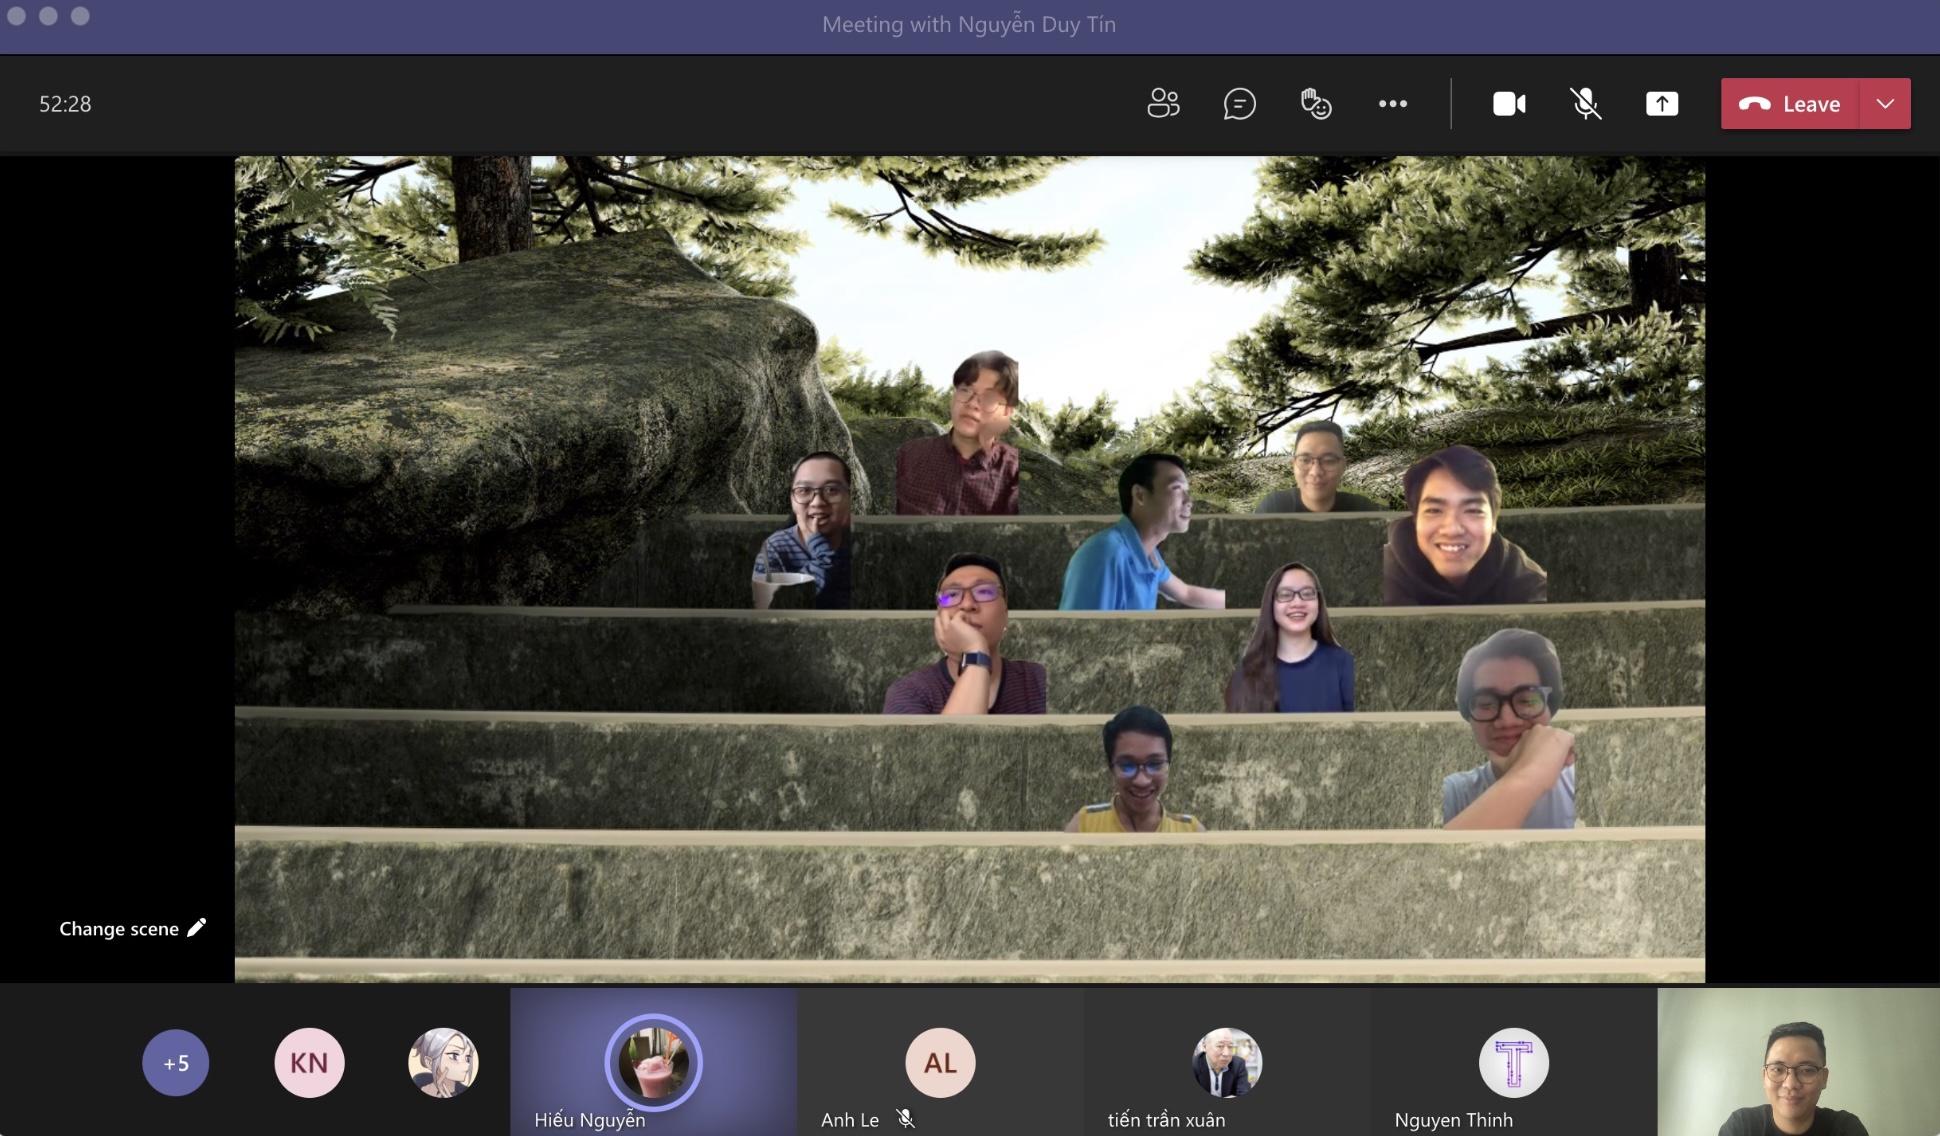 Tai sao webcam laptop xau te va cach khac phuc? anh 1